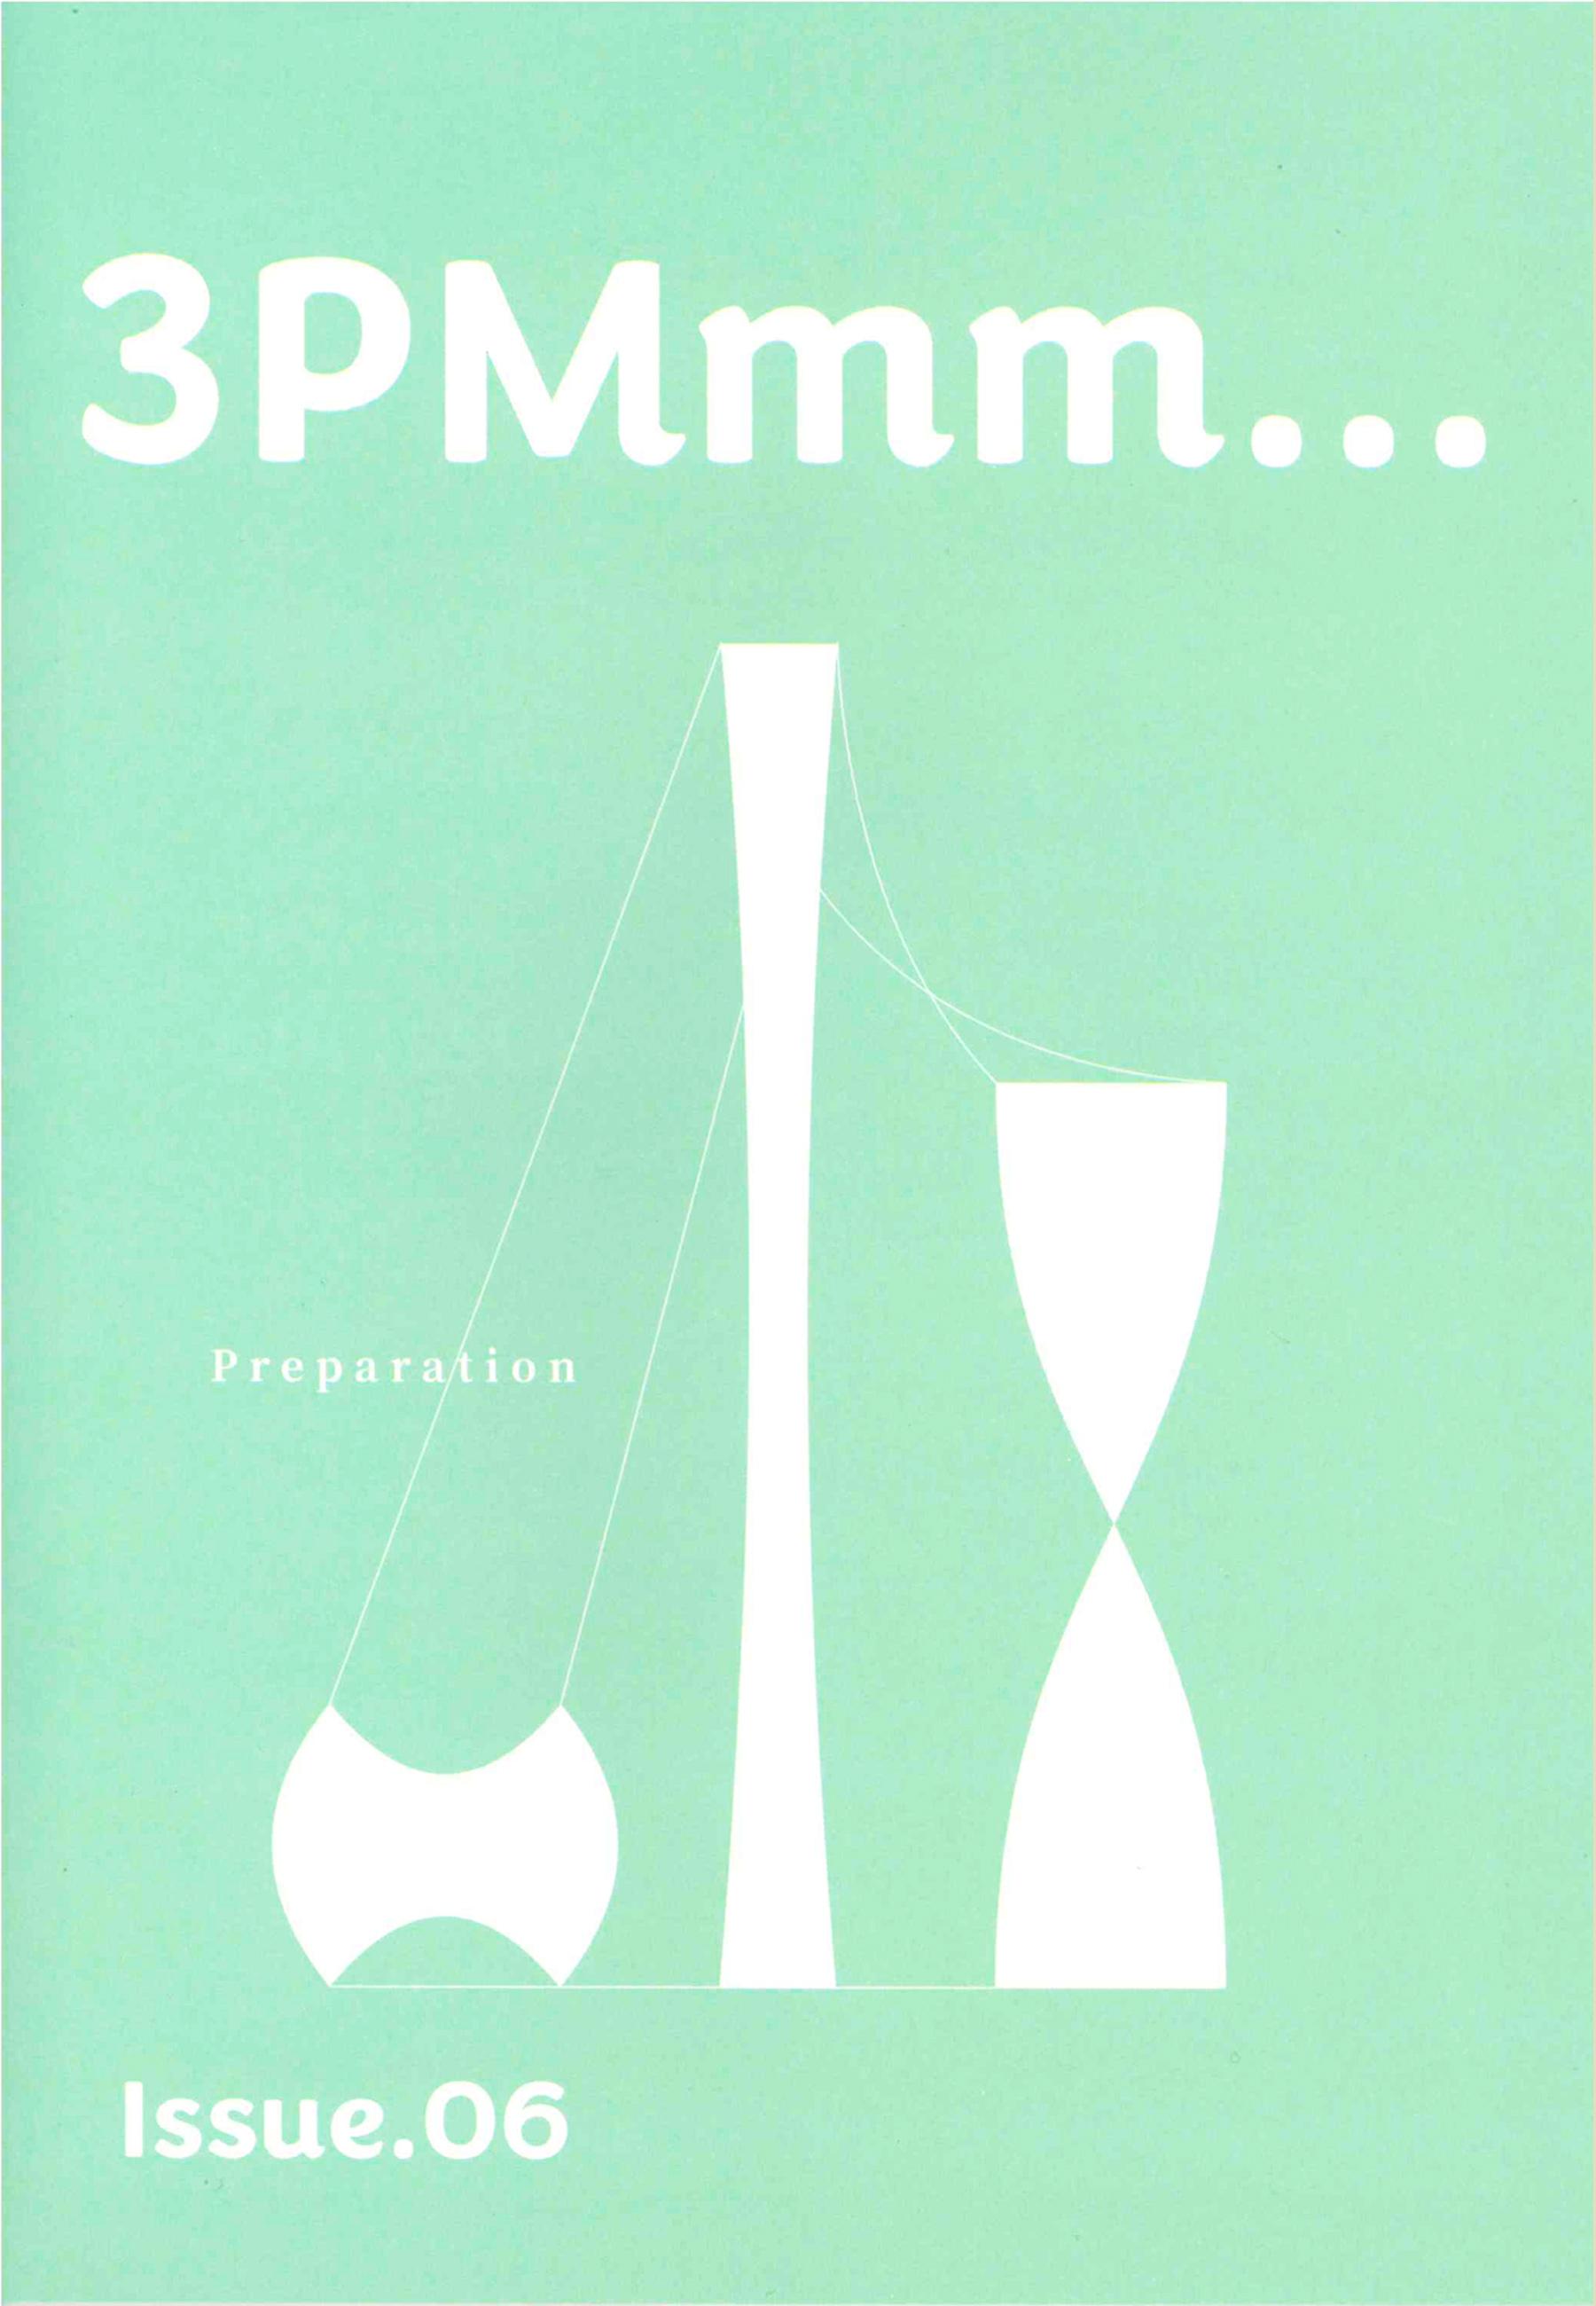 """3PMmm..."""